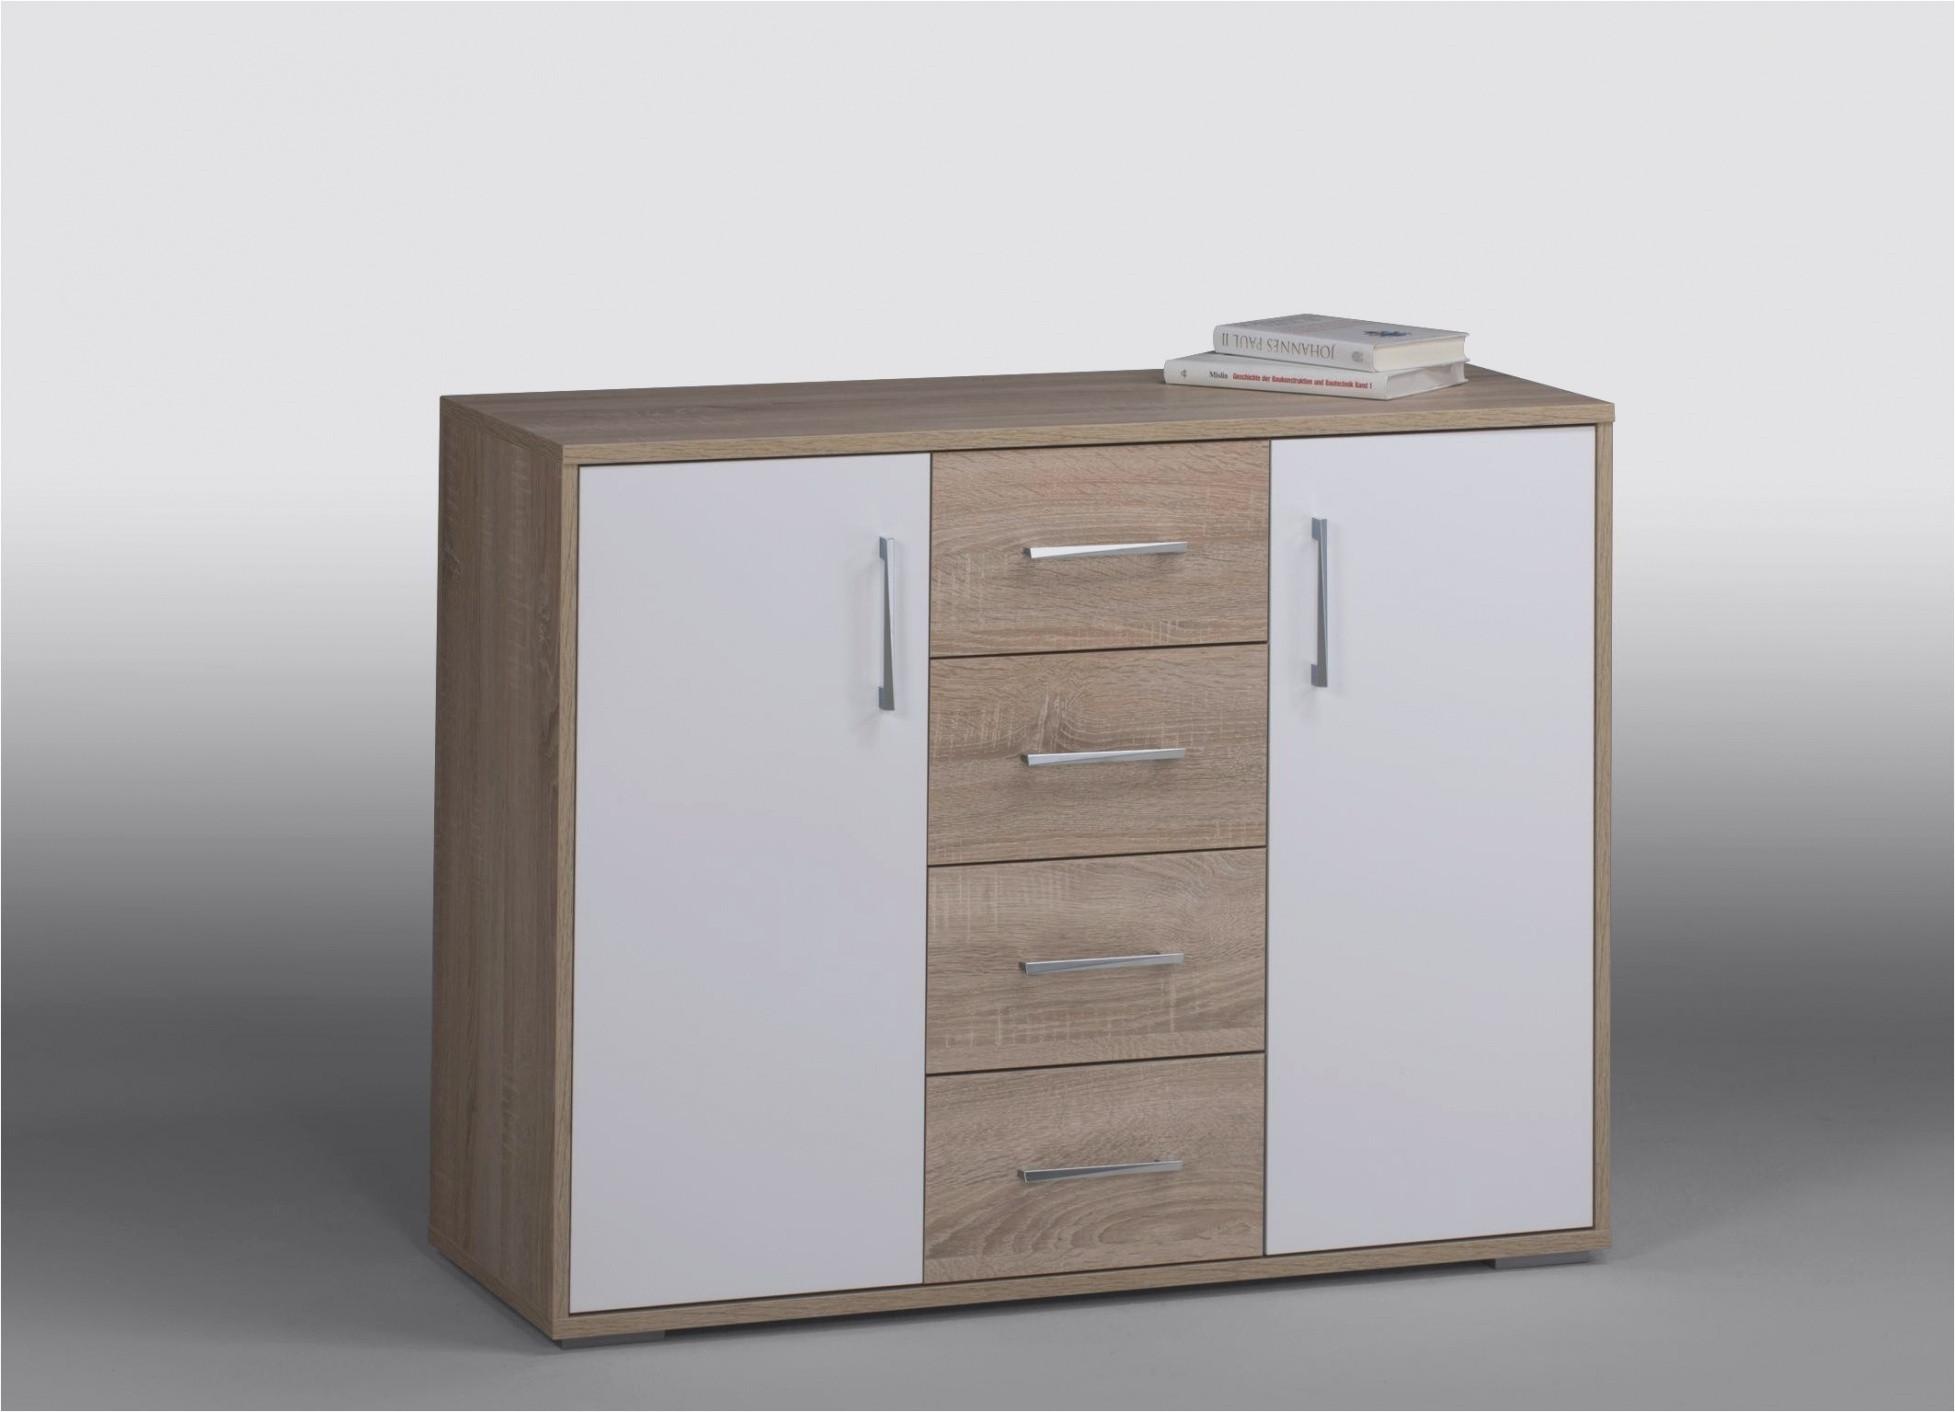 meuble tv angle conforama alinea meuble bois 95 modc2a8le meuble tv d angle conforama of meuble tv angle conforama